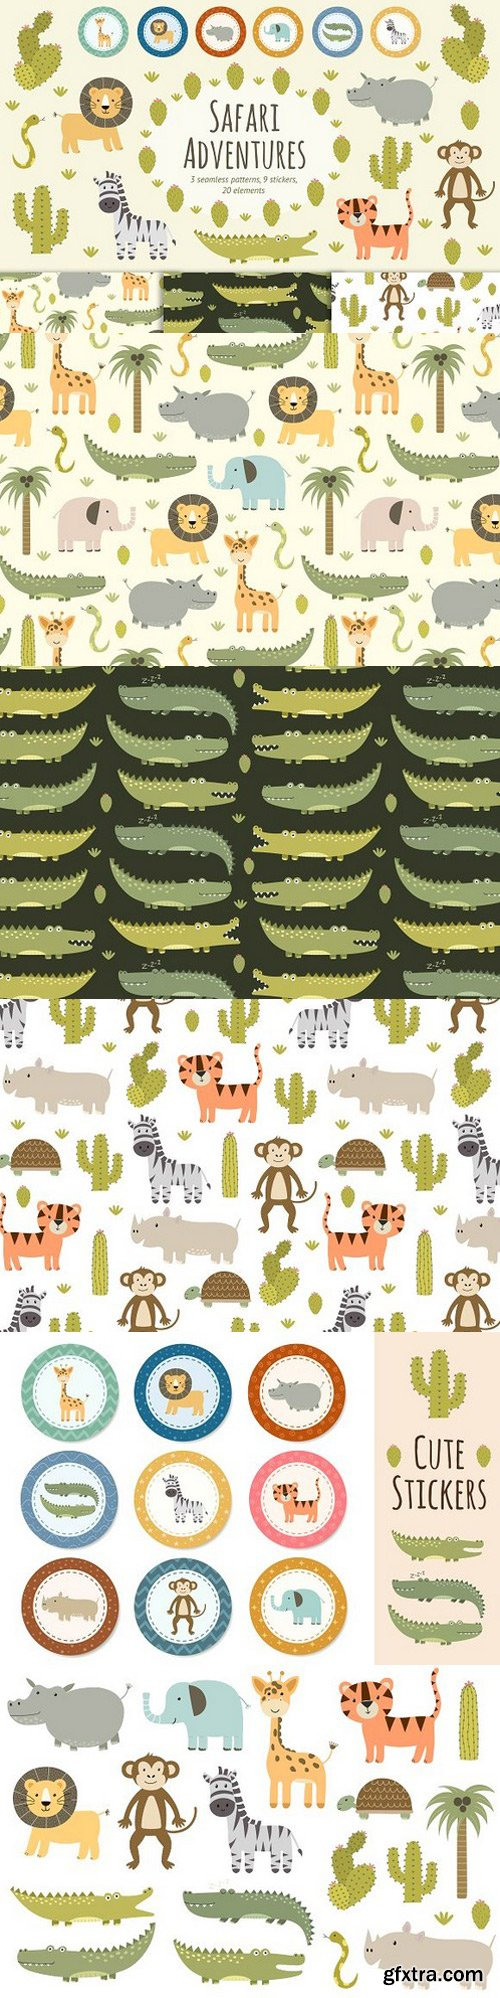 Safari animals patterns & stickers